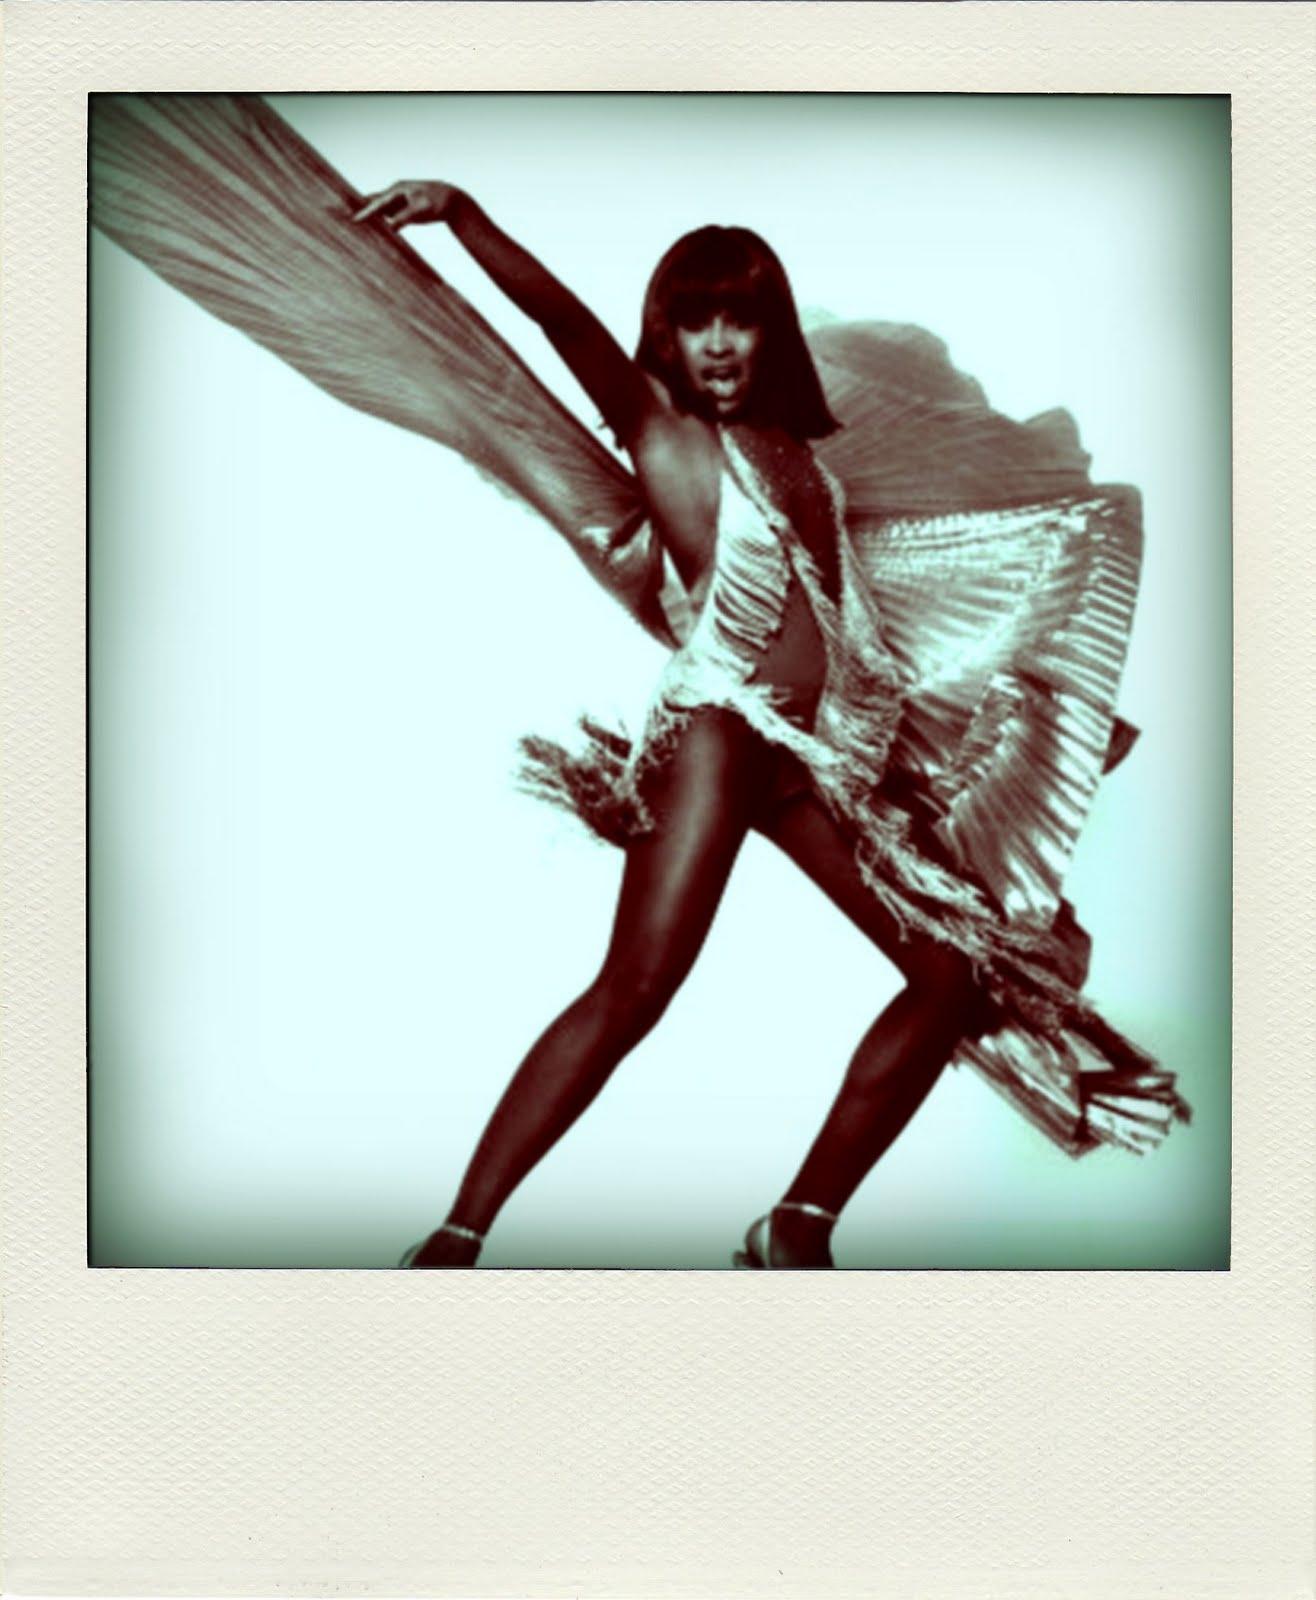 http://4.bp.blogspot.com/-oyiorWcuftI/TbJP_vmA4kI/AAAAAAAABD8/QbsbY4JMdGA/s1600/SUPER+DUPER+UBER+FRESH+STAR+CREATURE+OF+THE+WEEK-+The+Queen..+Tina+Turner.jpg